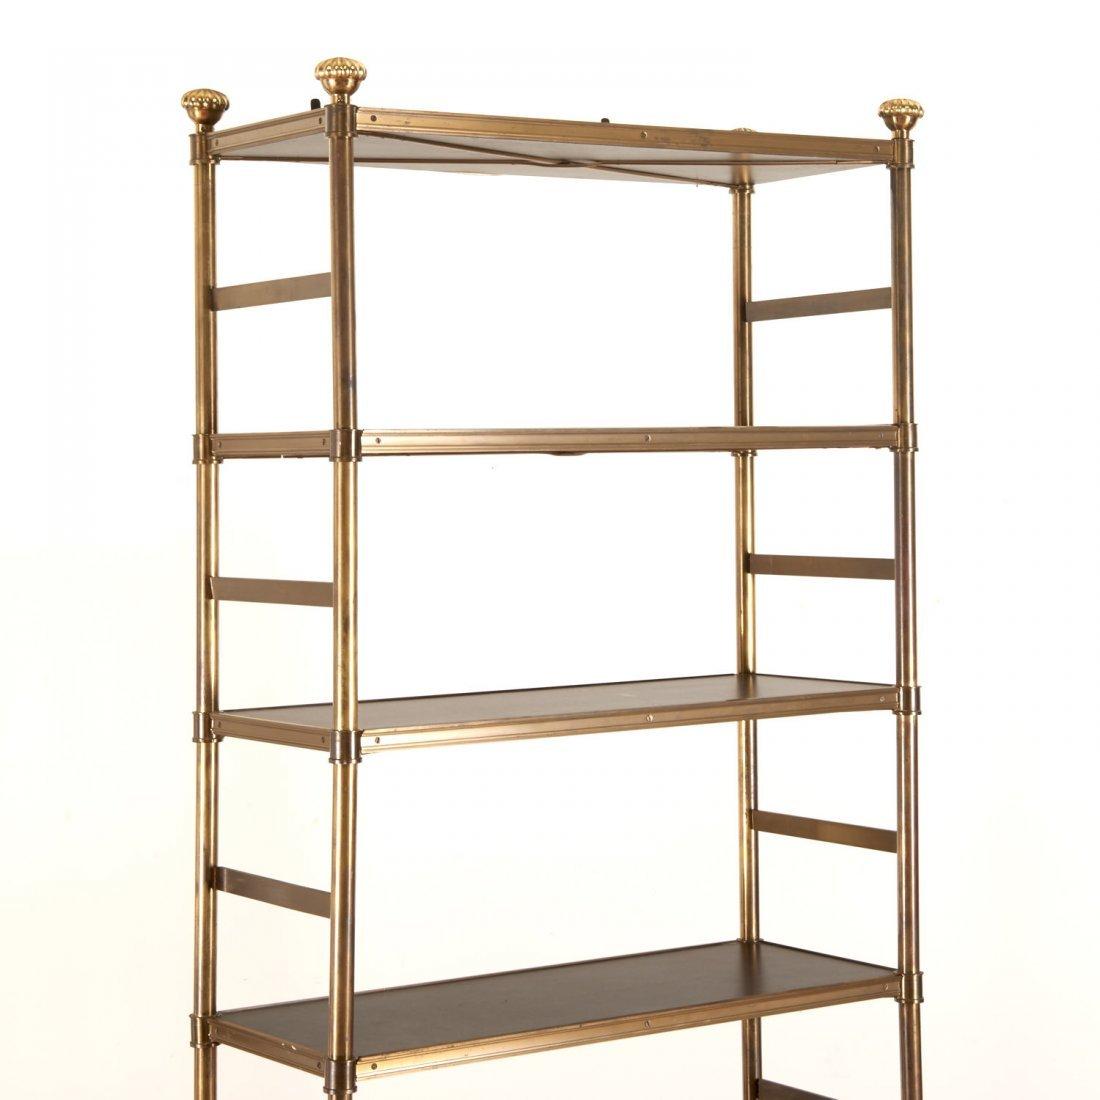 Attr. Maison Jansen brass, ebonized wood etagere - 2